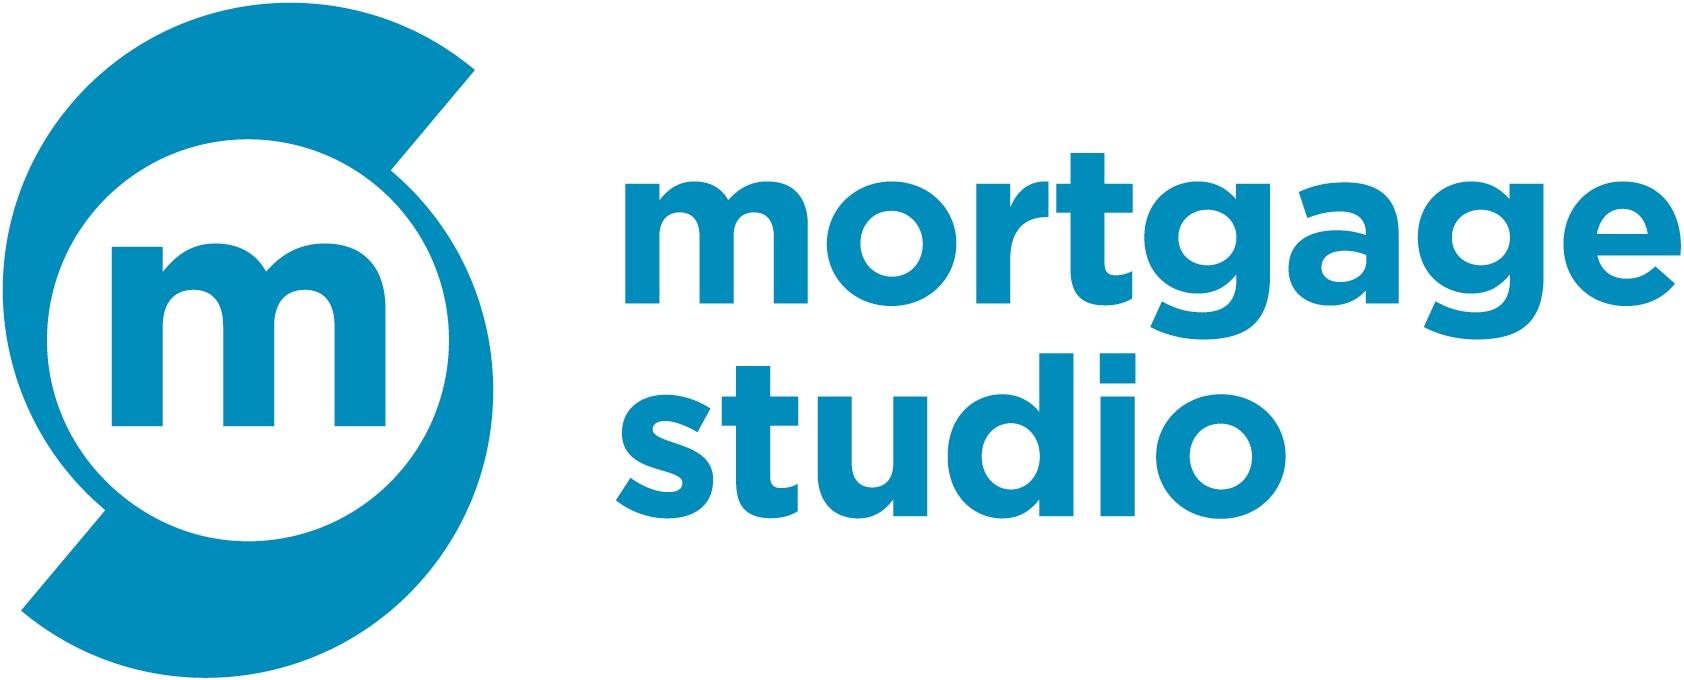 Mortgage Studio